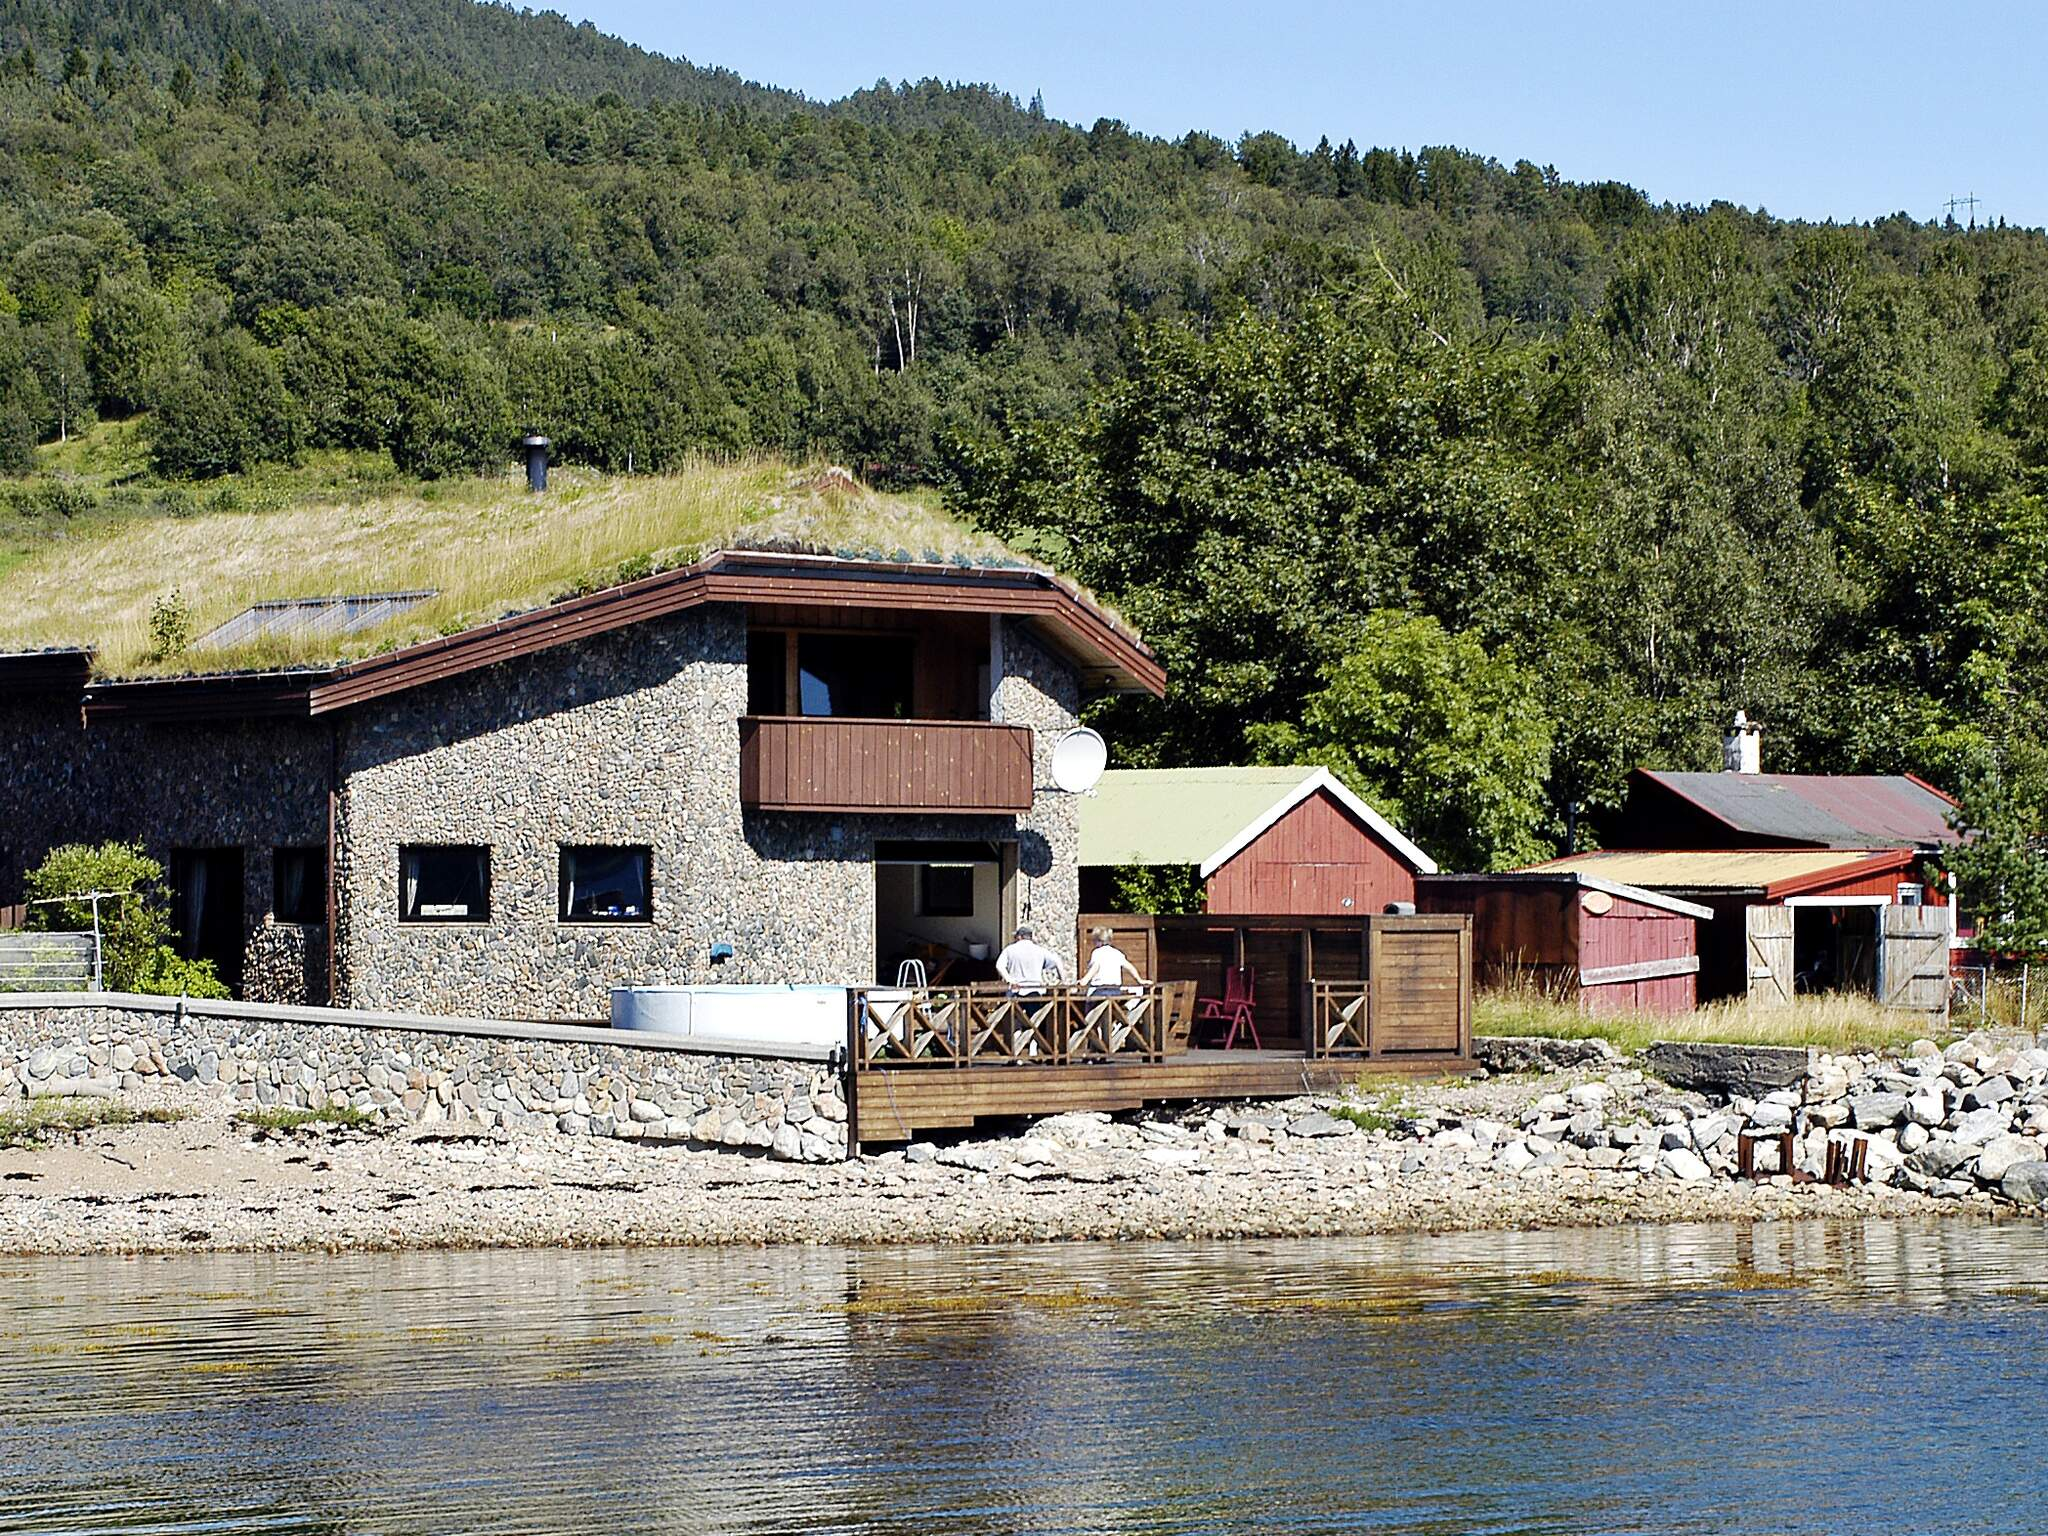 Ferienhaus Eidsvåg (84695), Eidsvåg, More - Romsdal, Westnorwegen, Norwegen, Bild 29